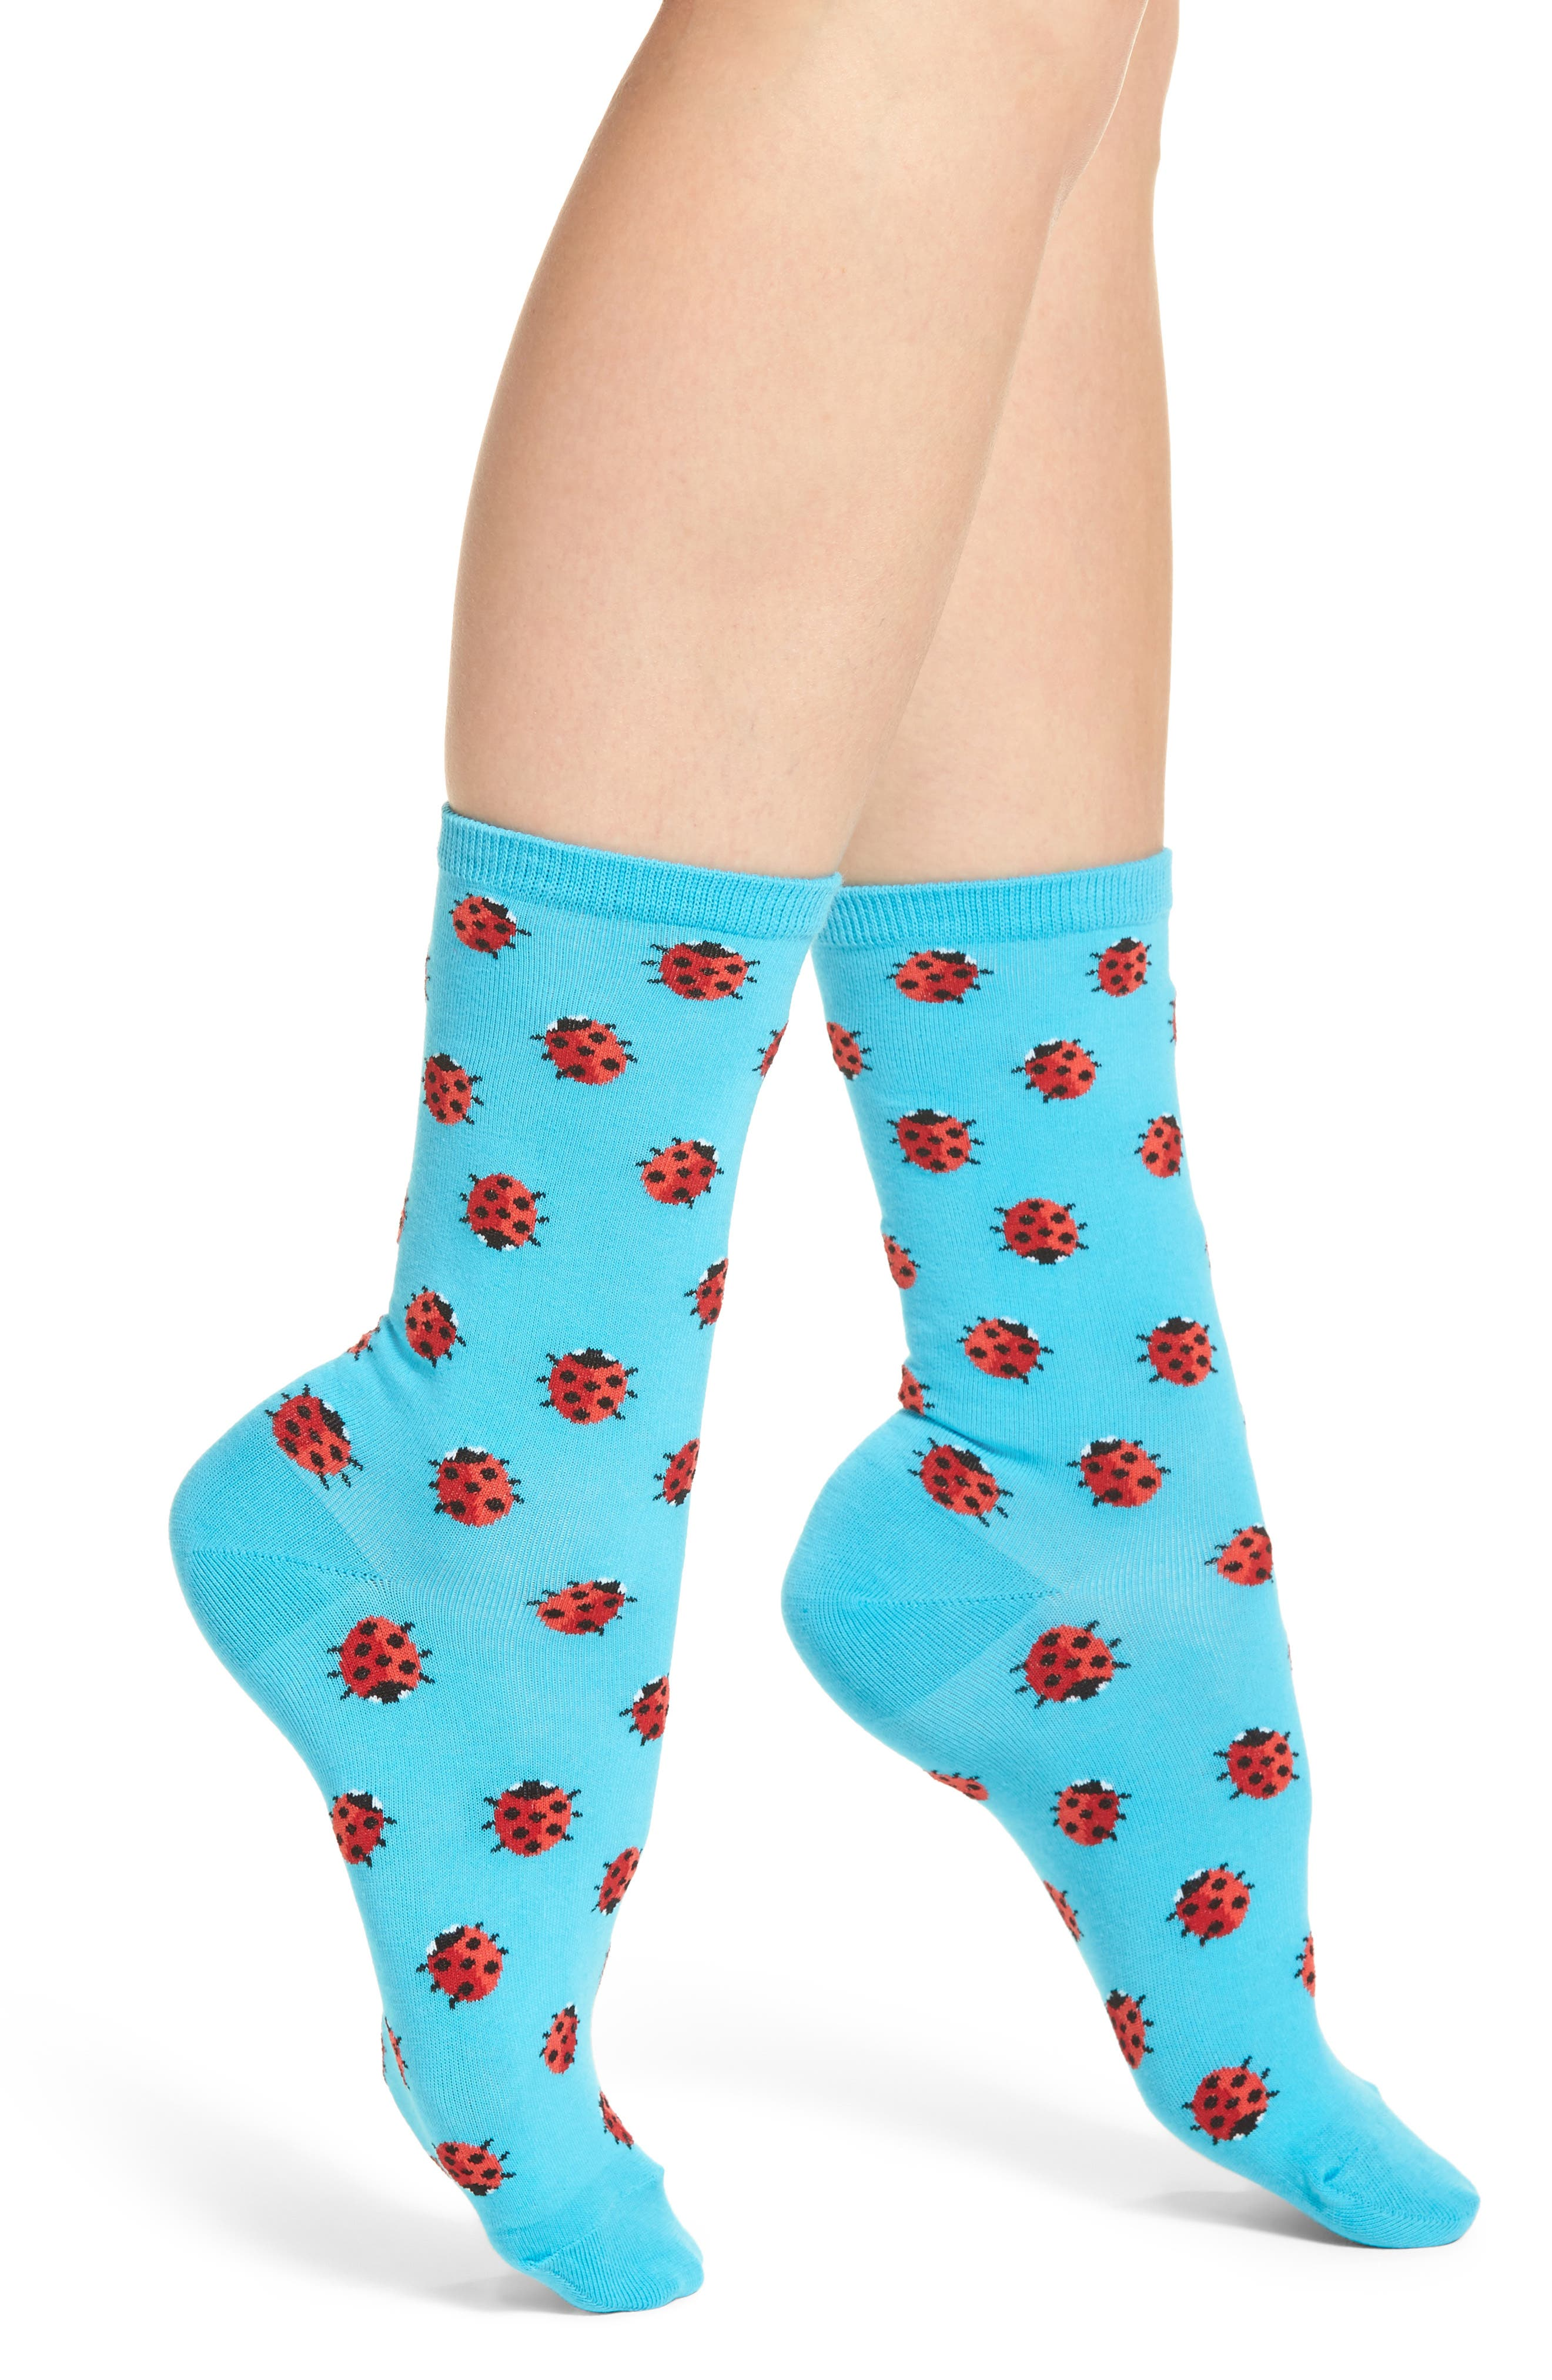 Ladybug Crew Socks,                             Main thumbnail 1, color,                             Light Blue